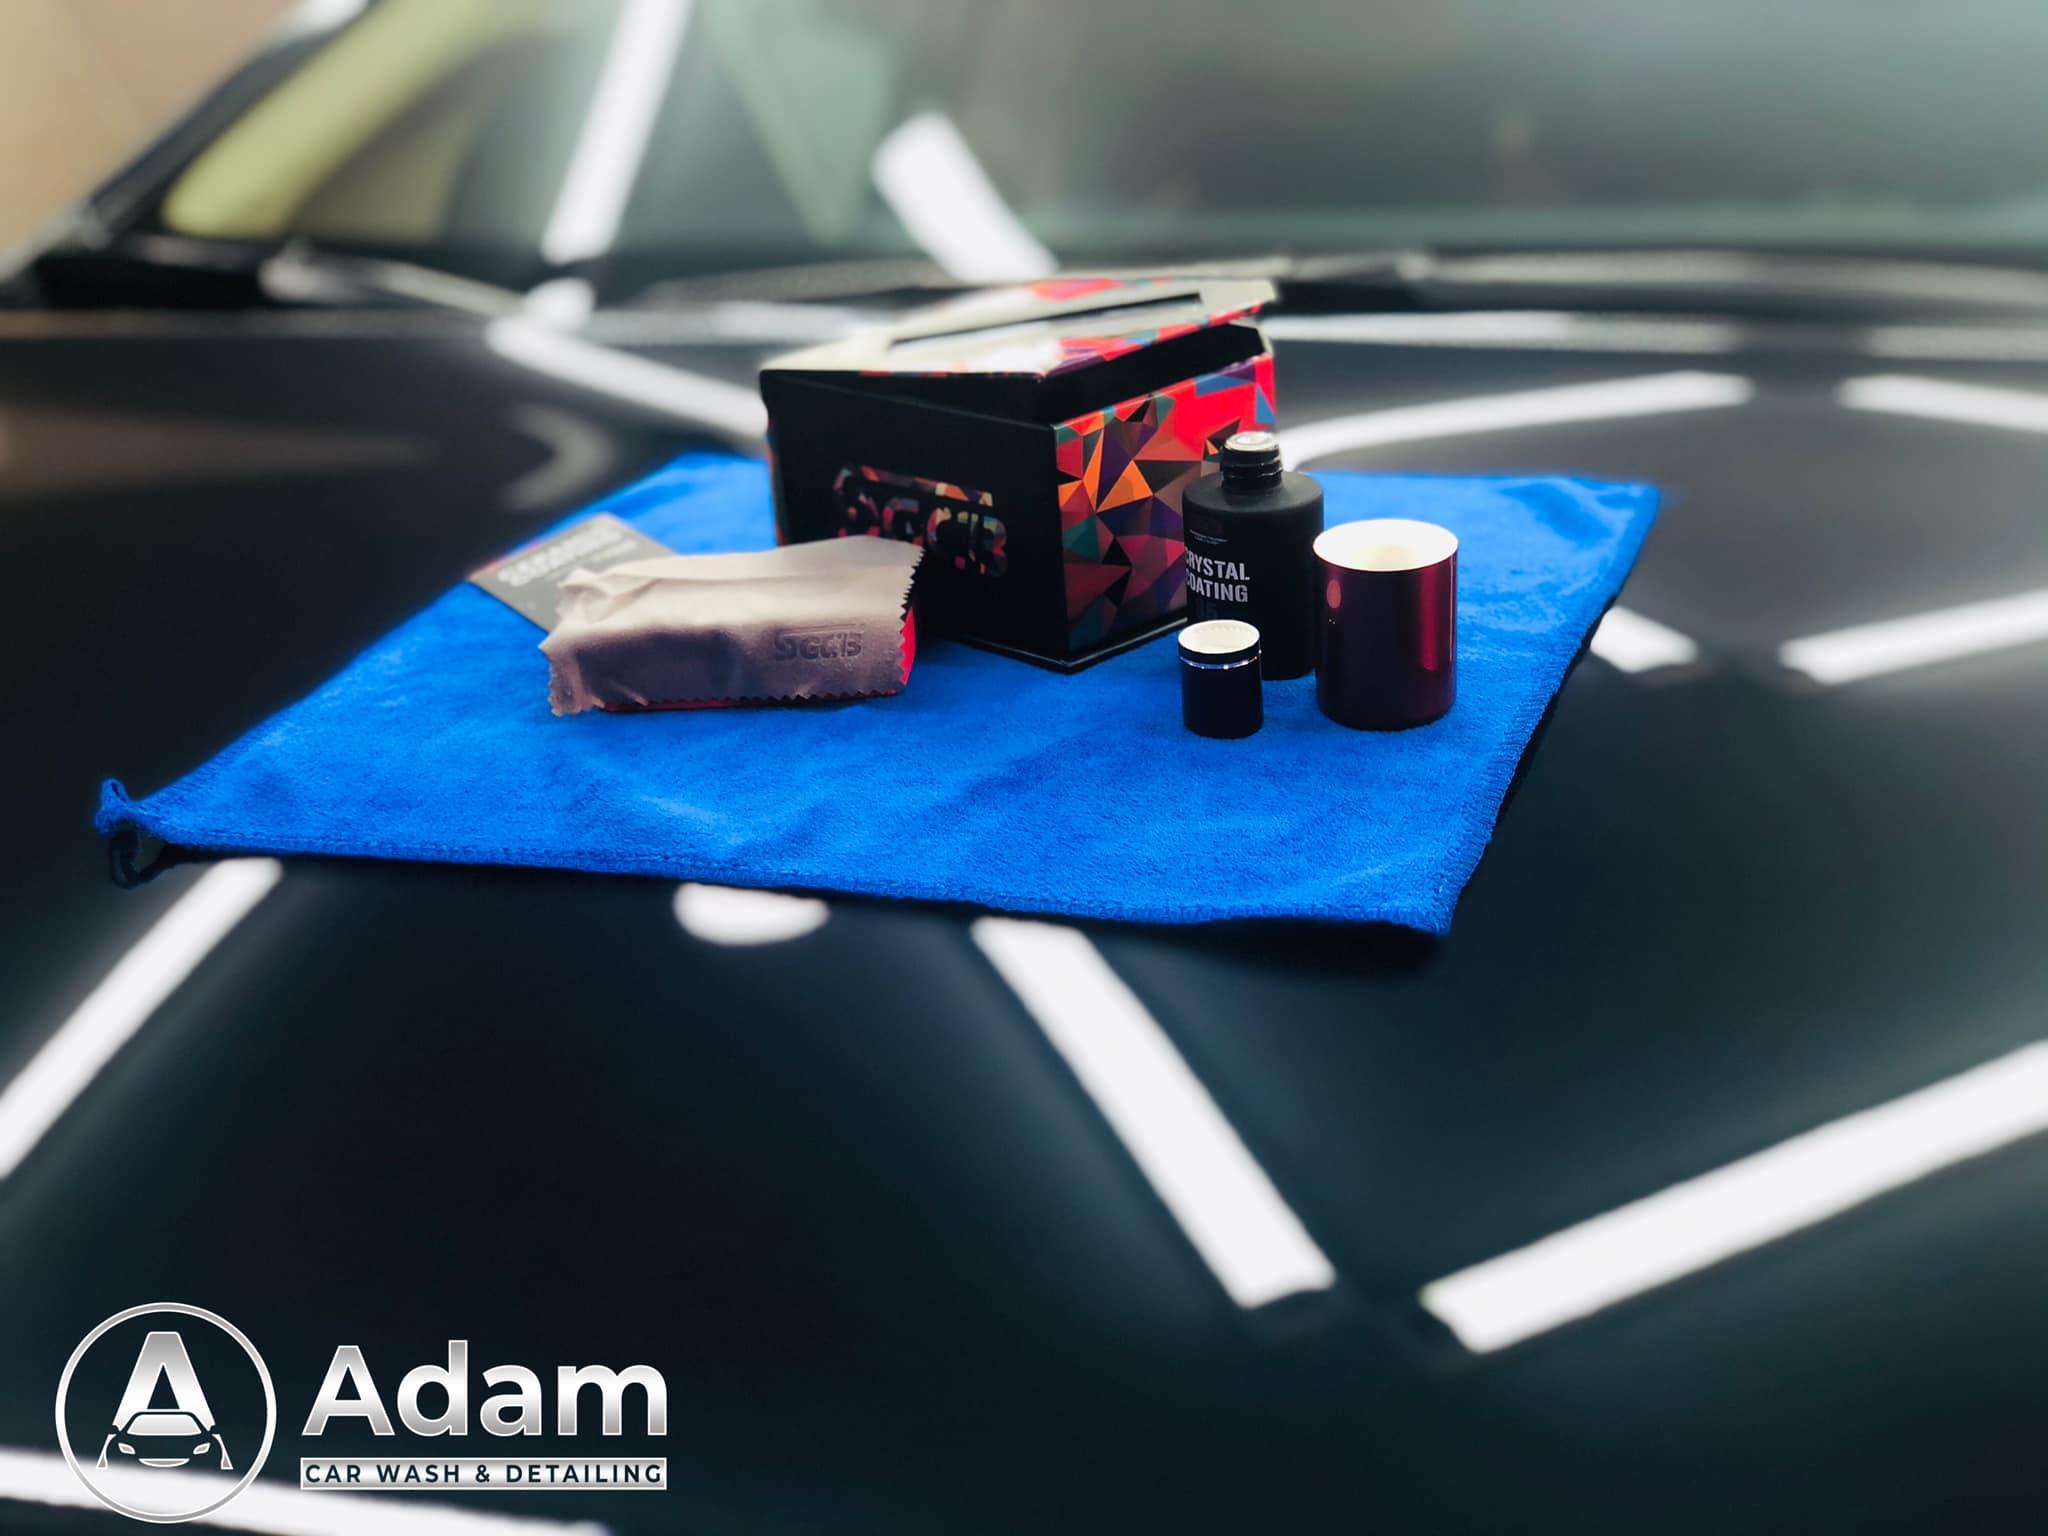 adam-car-wash-detailing-dai-ly-sgcb-khu-vuc-go-vap-1